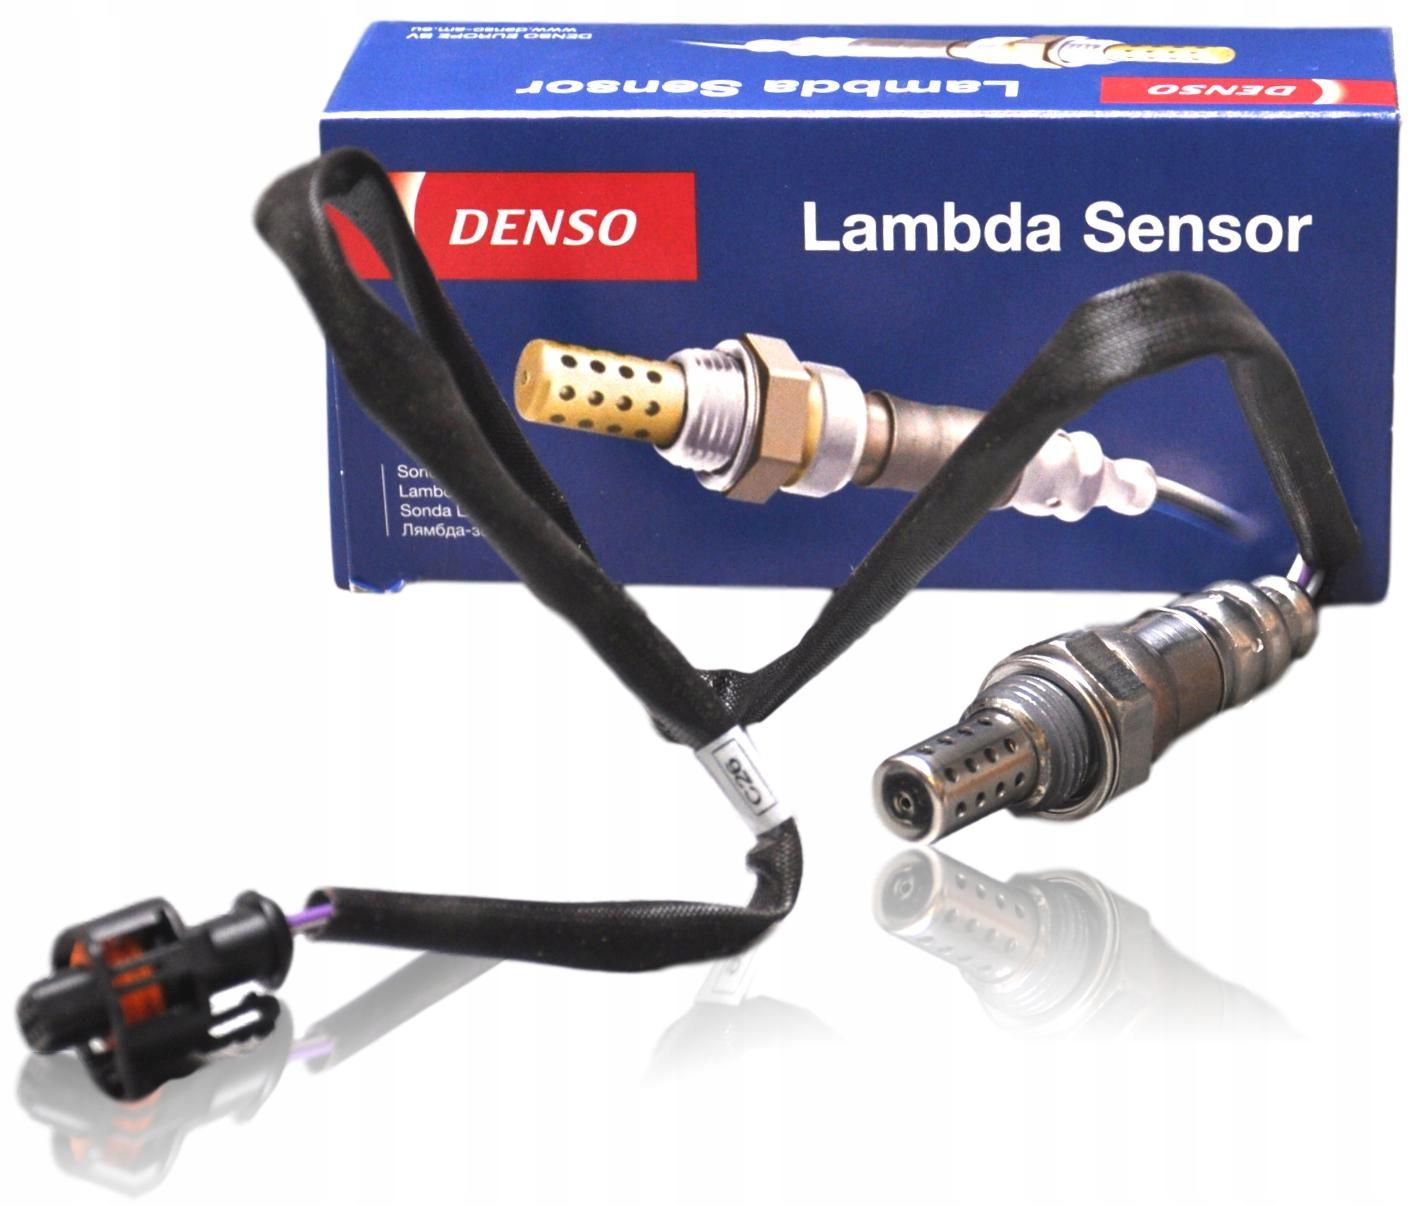 DOX-2066 Denso Sonde lambda